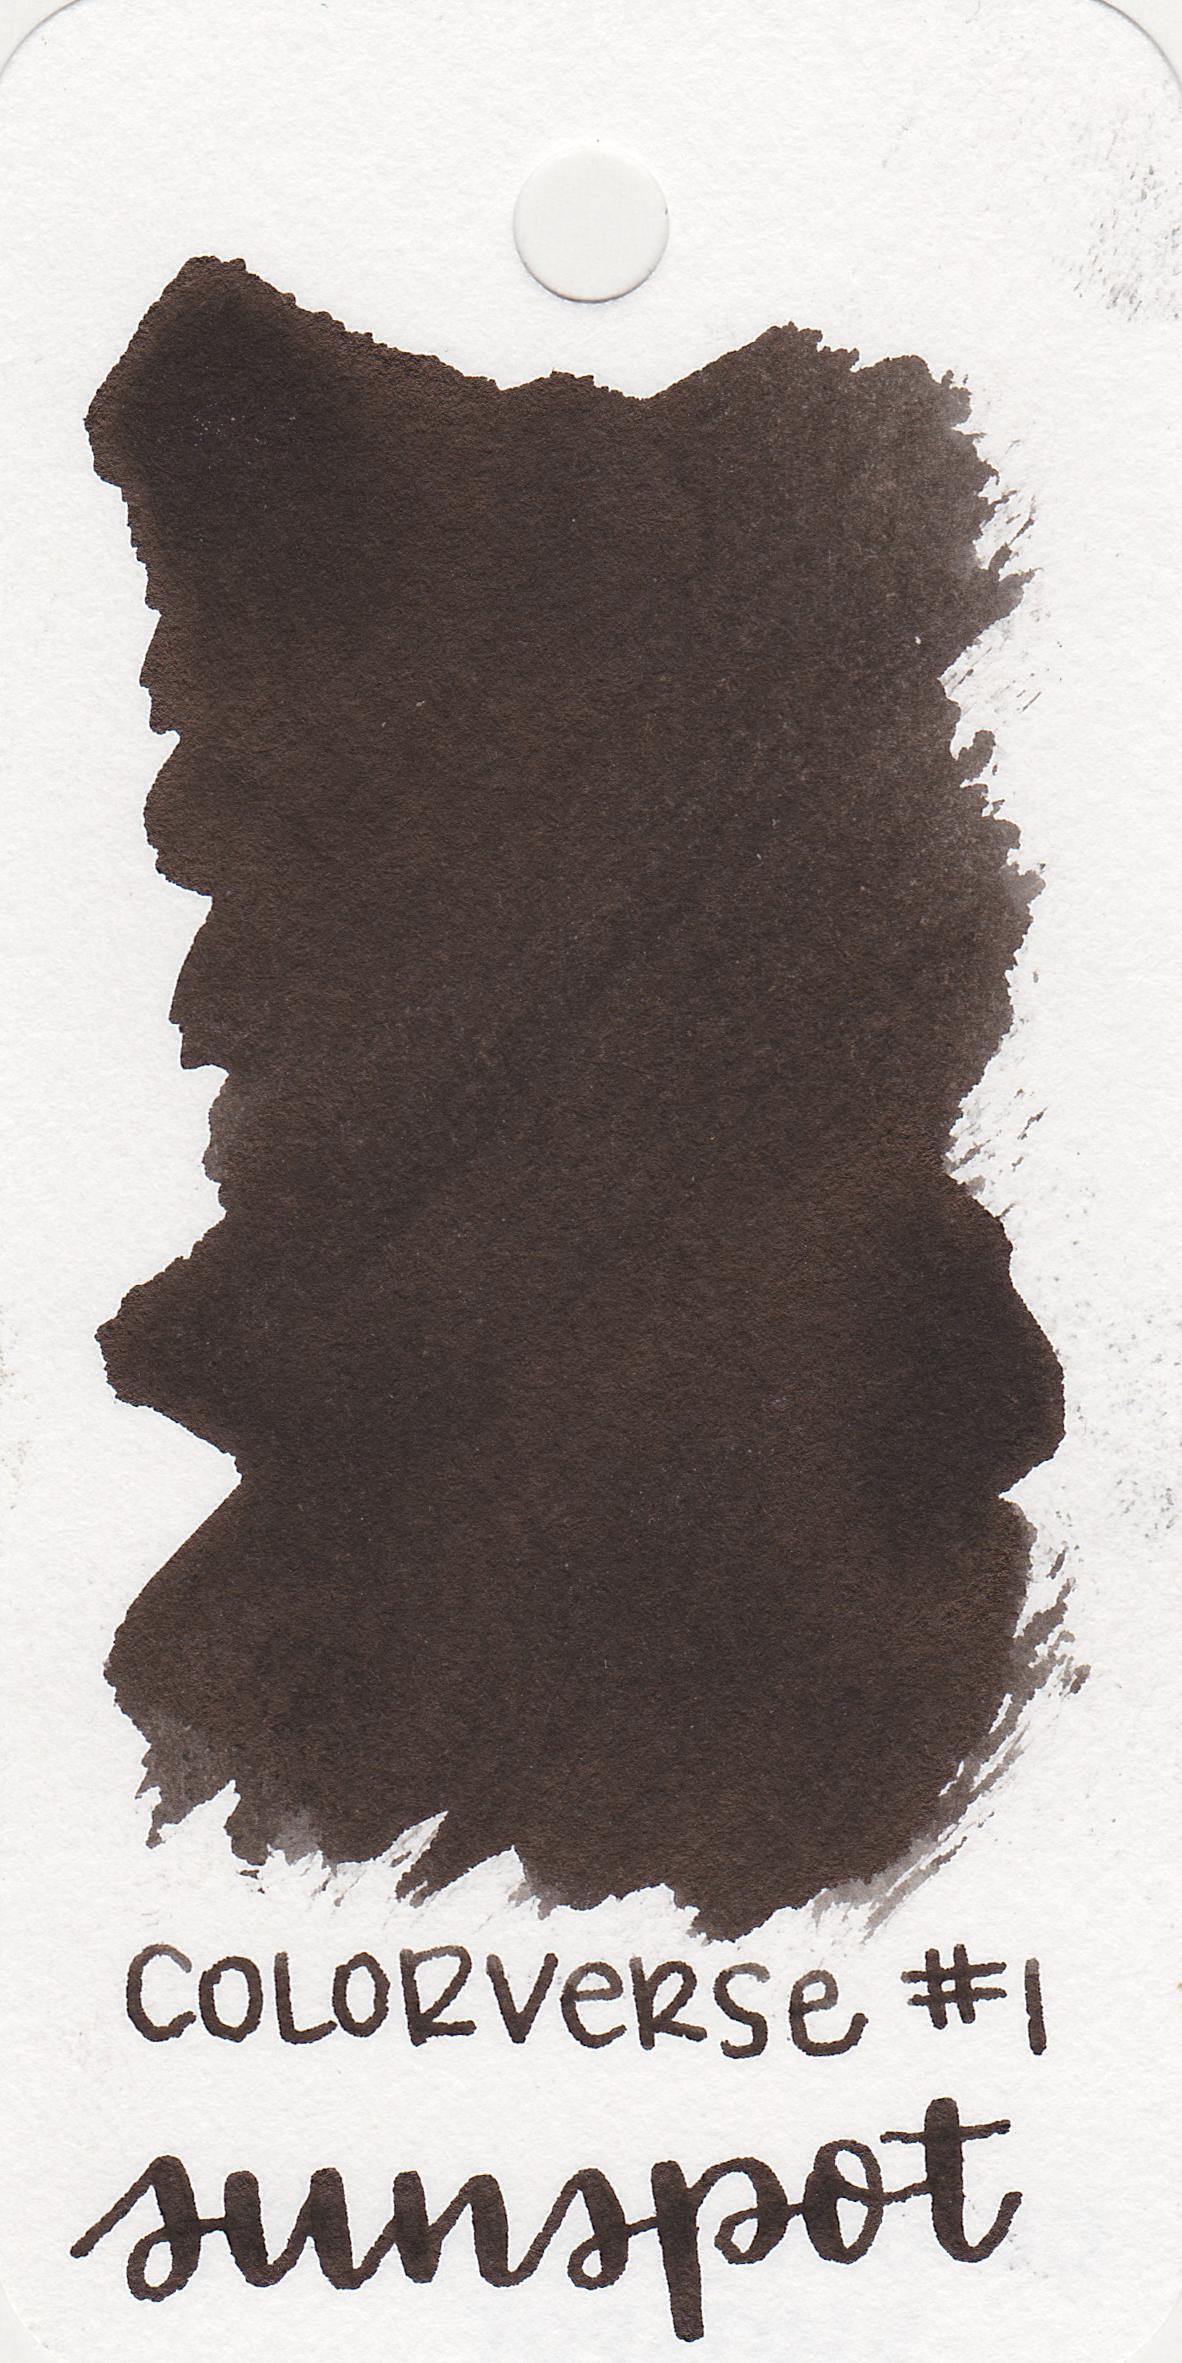 cv-sunspot-1.jpg